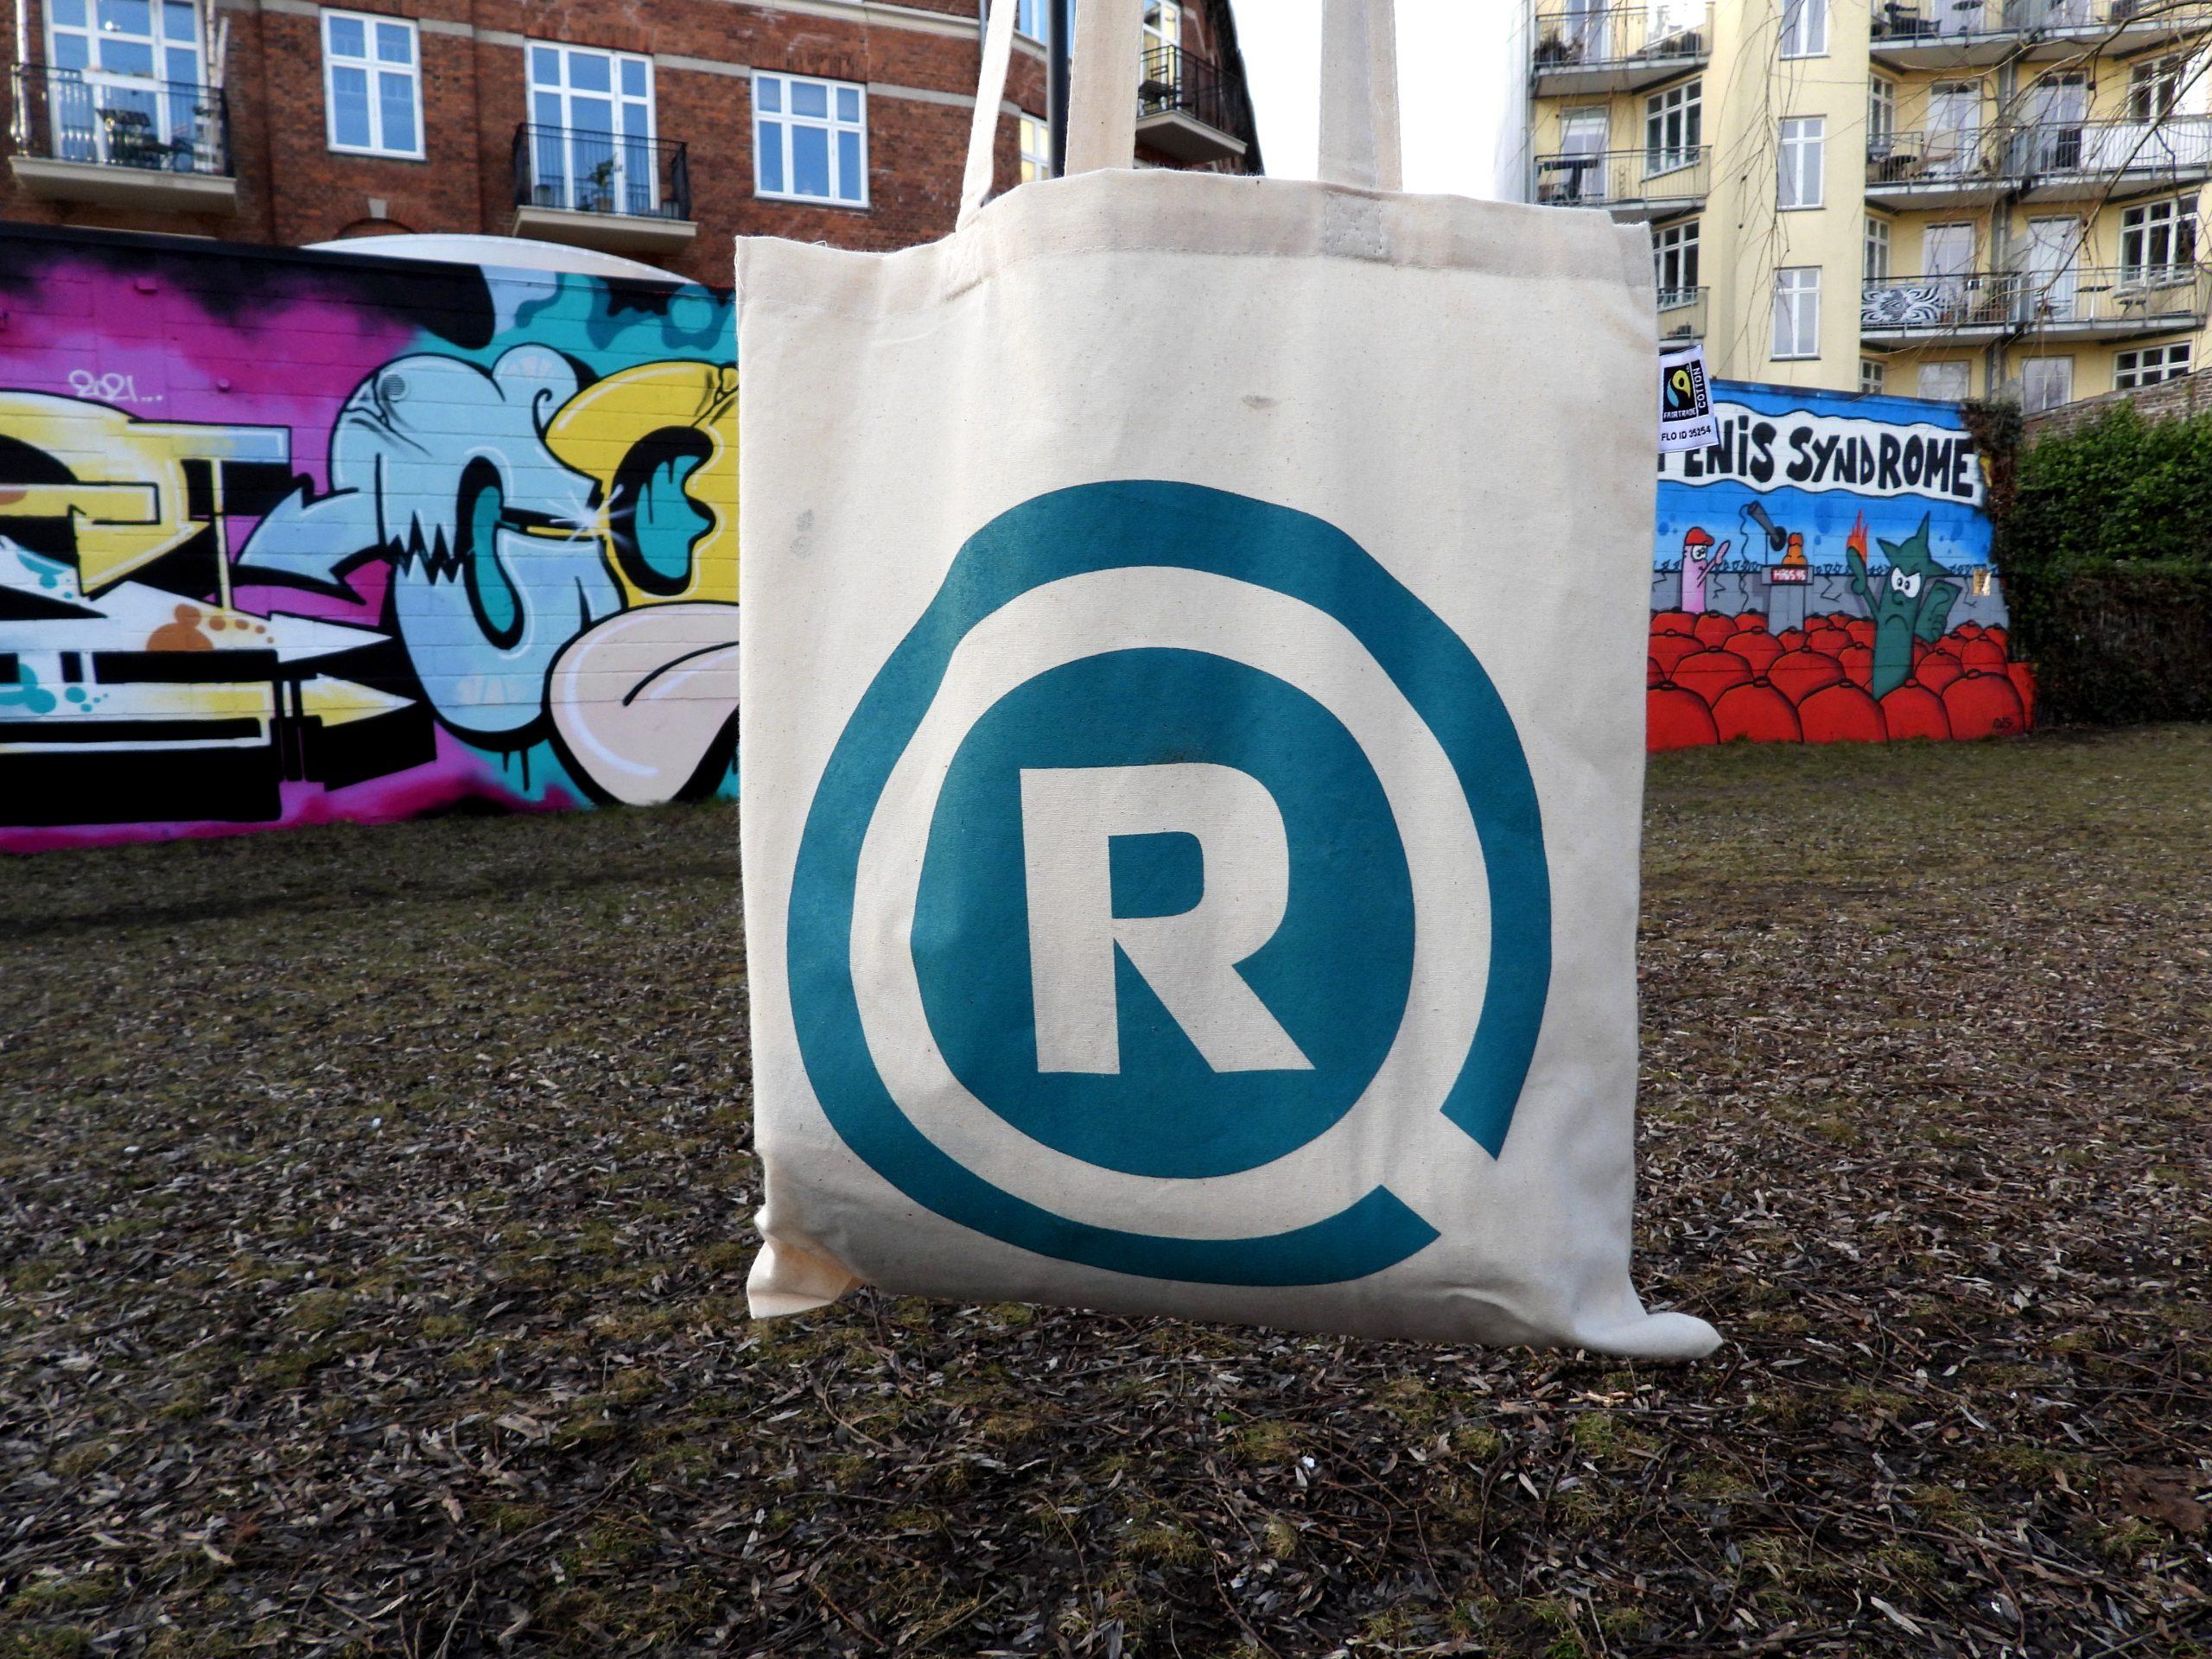 Redox' nye lækre økologiske fairtrade mulepose.